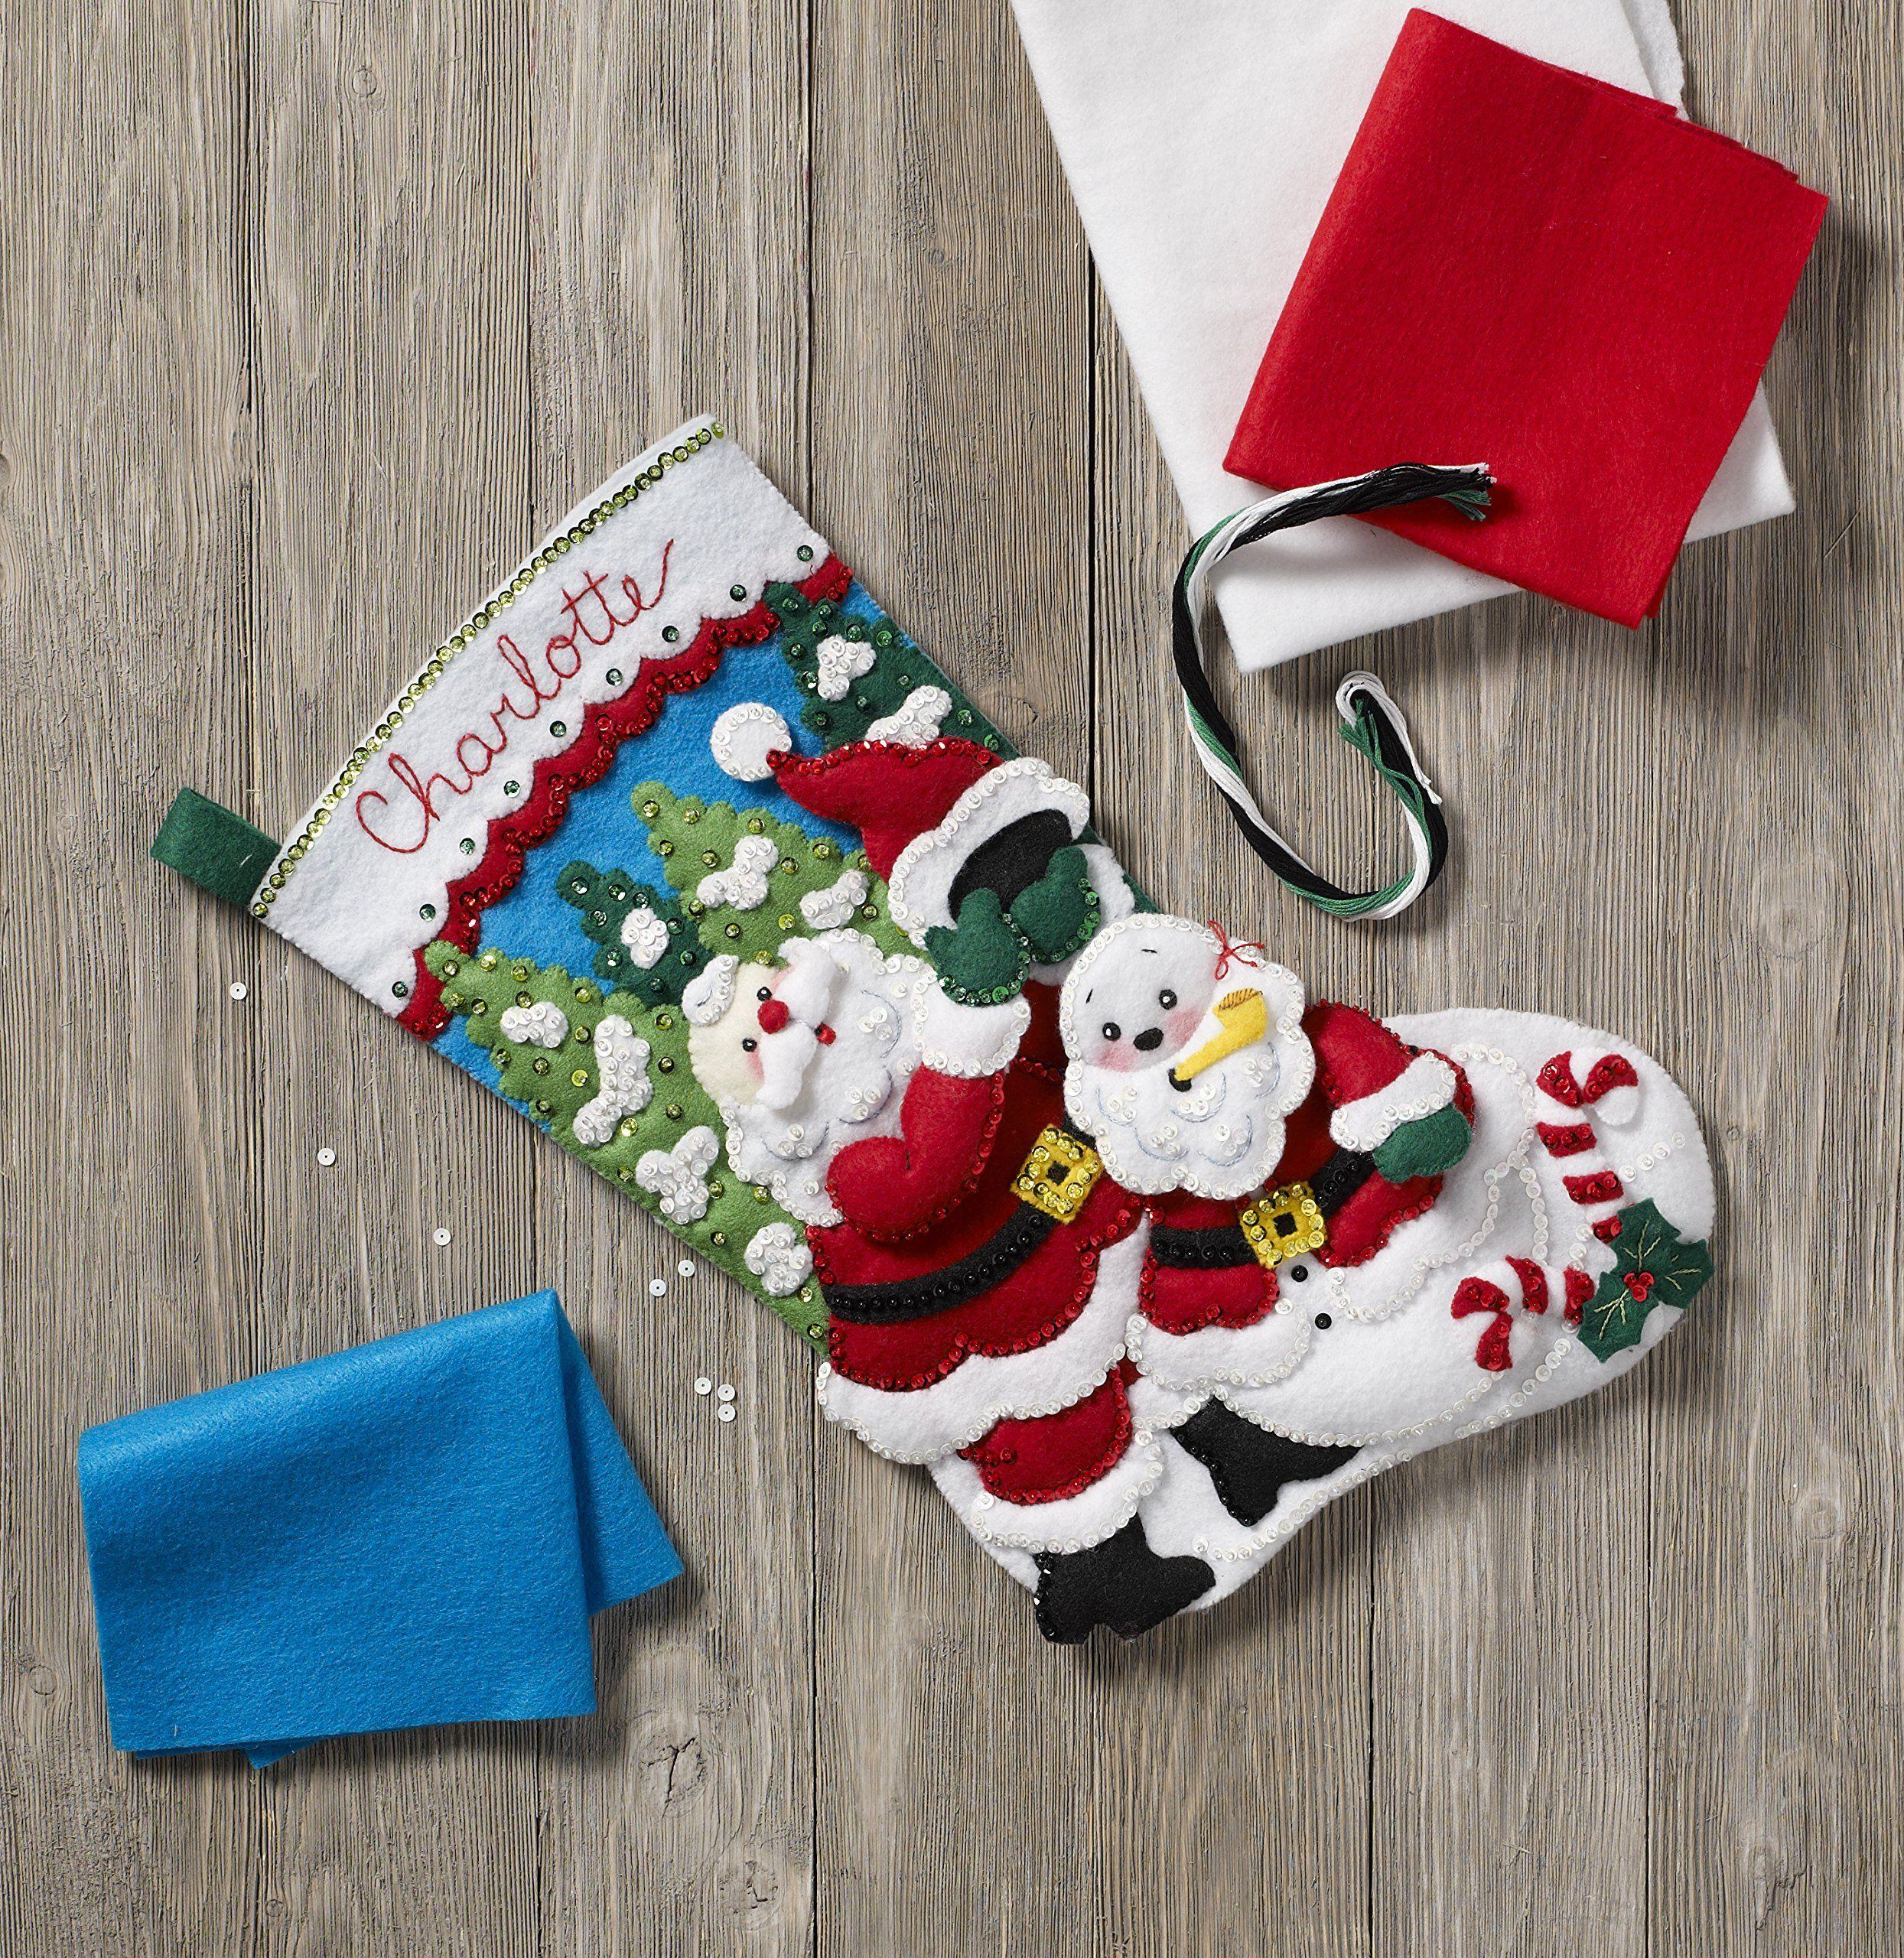 Bucilla 86862 Santas Snowman Stocking Kit * You Can Get